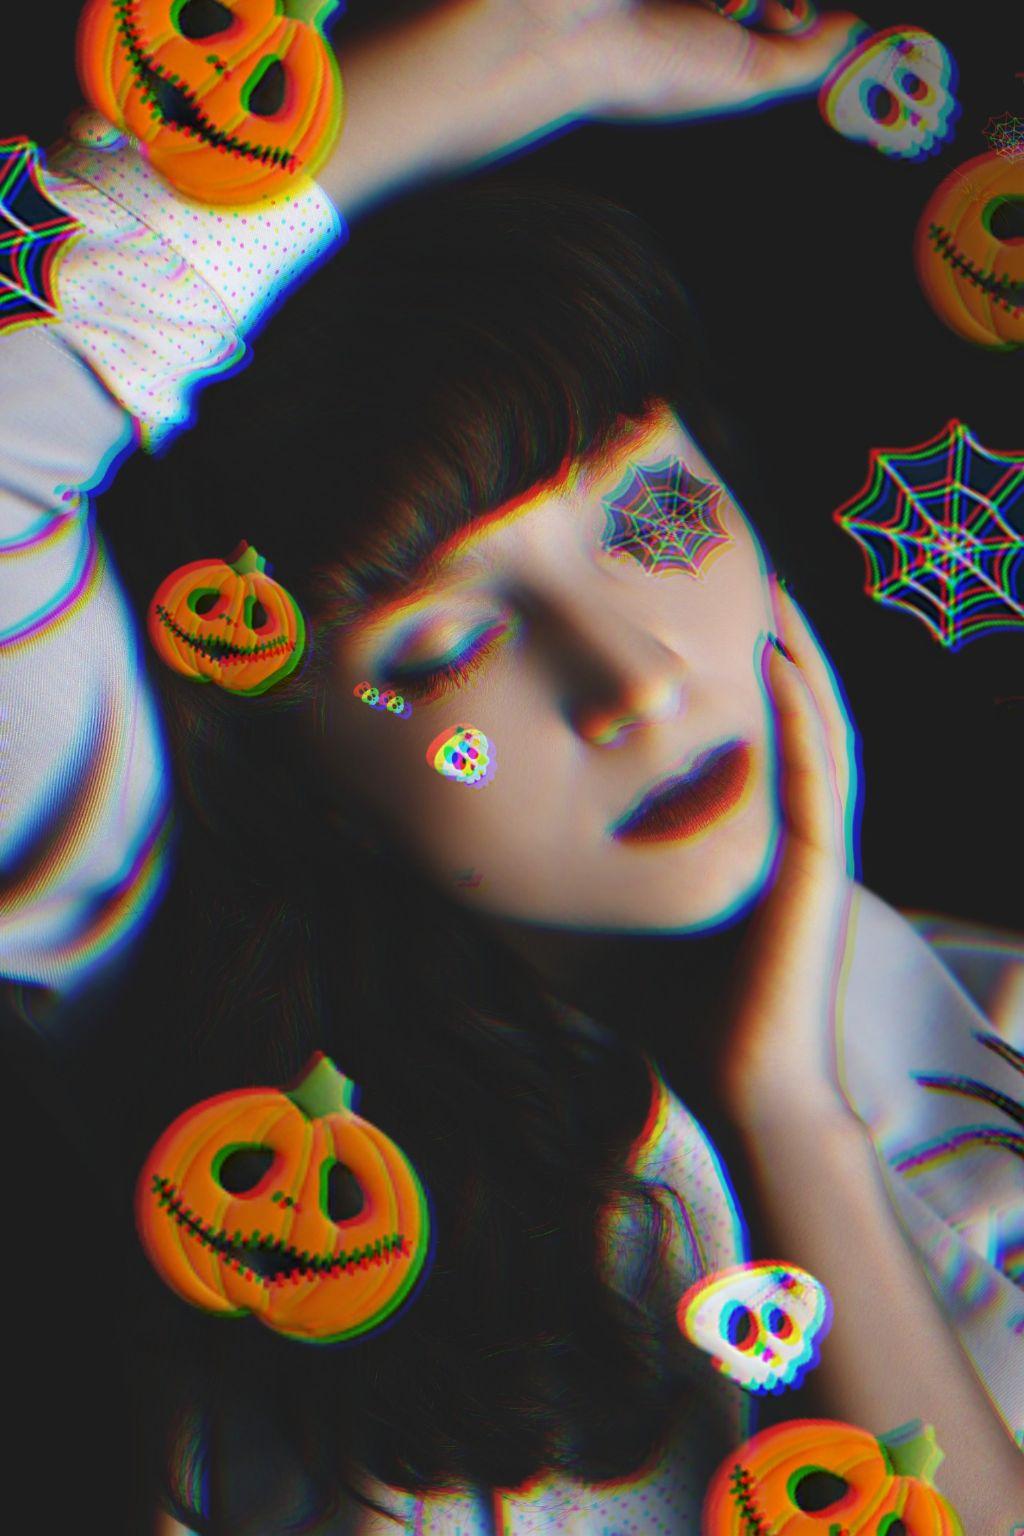 #freetoedit #madewithpicsart #glitch #halloween